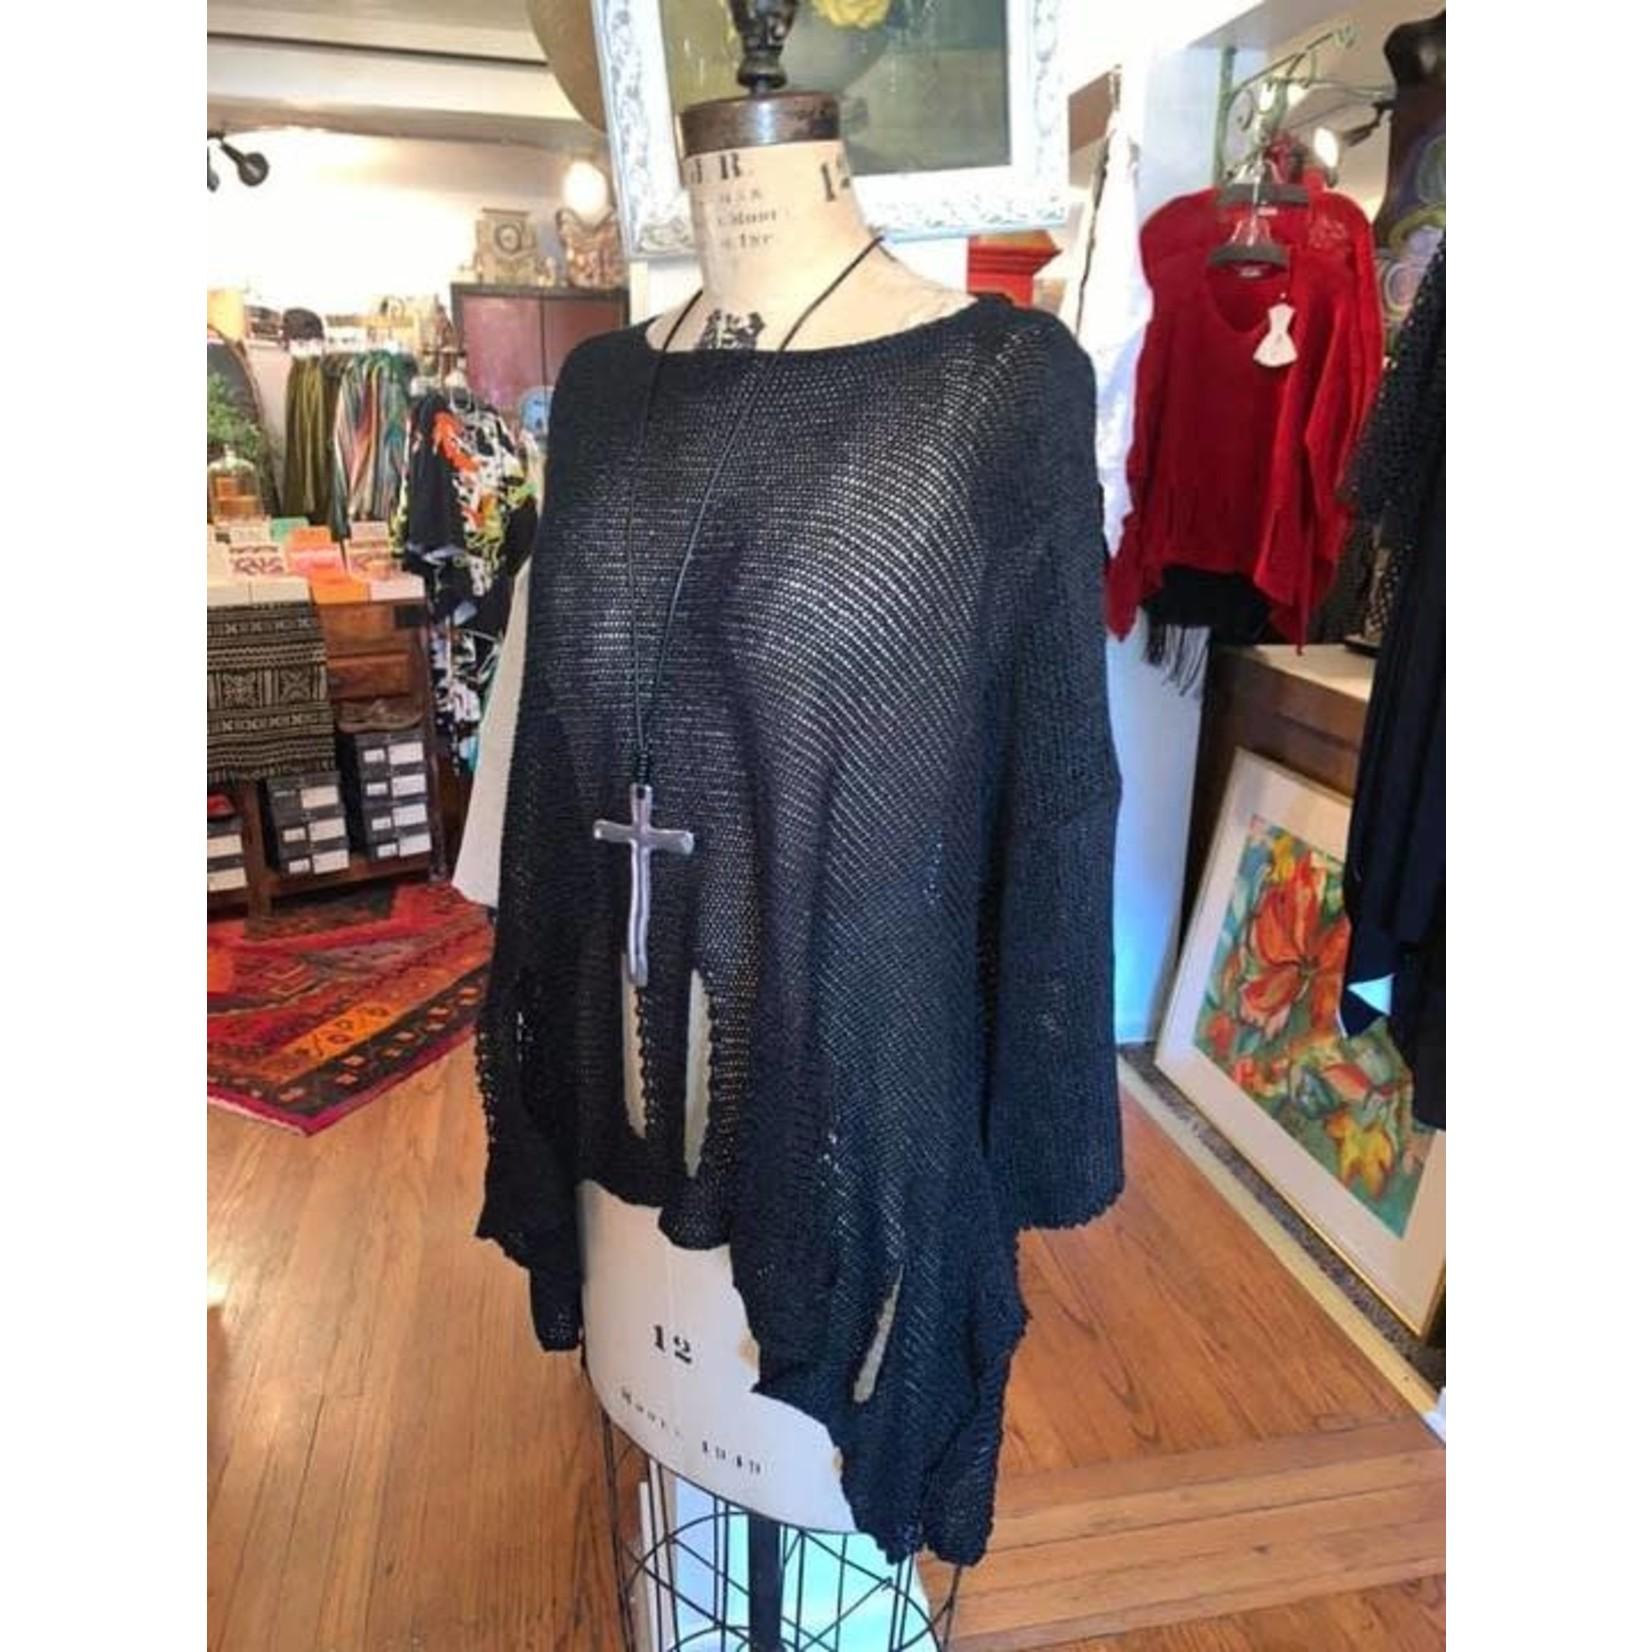 Holey Moley Sweater Fine Gauge O/S Black